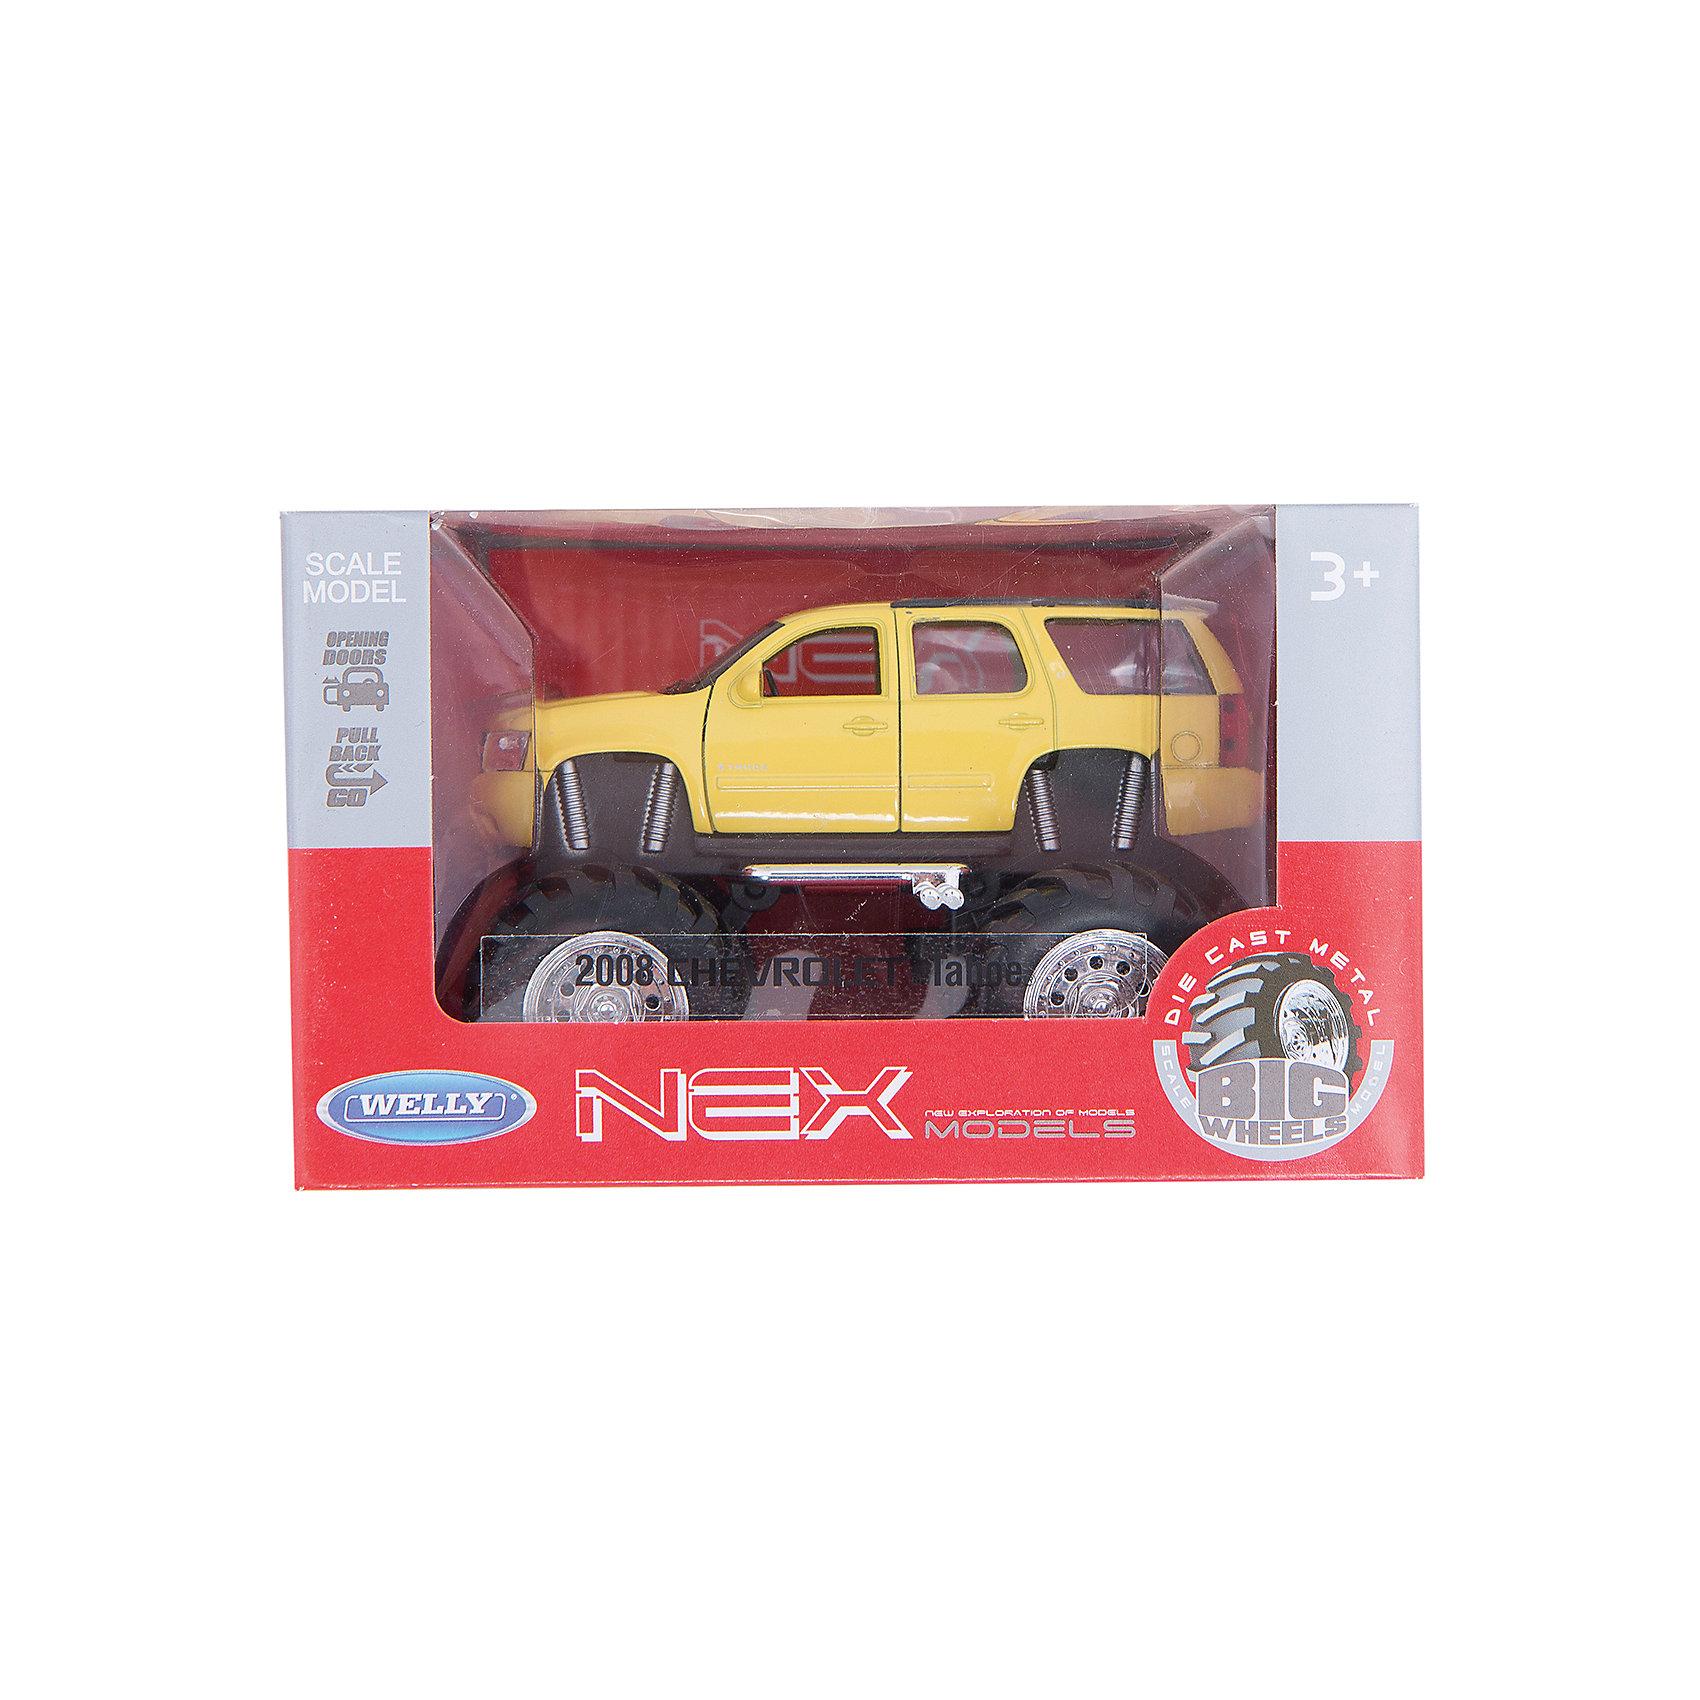 Модель машины 1:34-39 Chevrolet Tahoe Big Wheel, жёлтая, Welly<br><br>Ширина мм: 155<br>Глубина мм: 95<br>Высота мм: 100<br>Вес г: 294<br>Возраст от месяцев: 36<br>Возраст до месяцев: 2147483647<br>Пол: Мужской<br>Возраст: Детский<br>SKU: 5255010